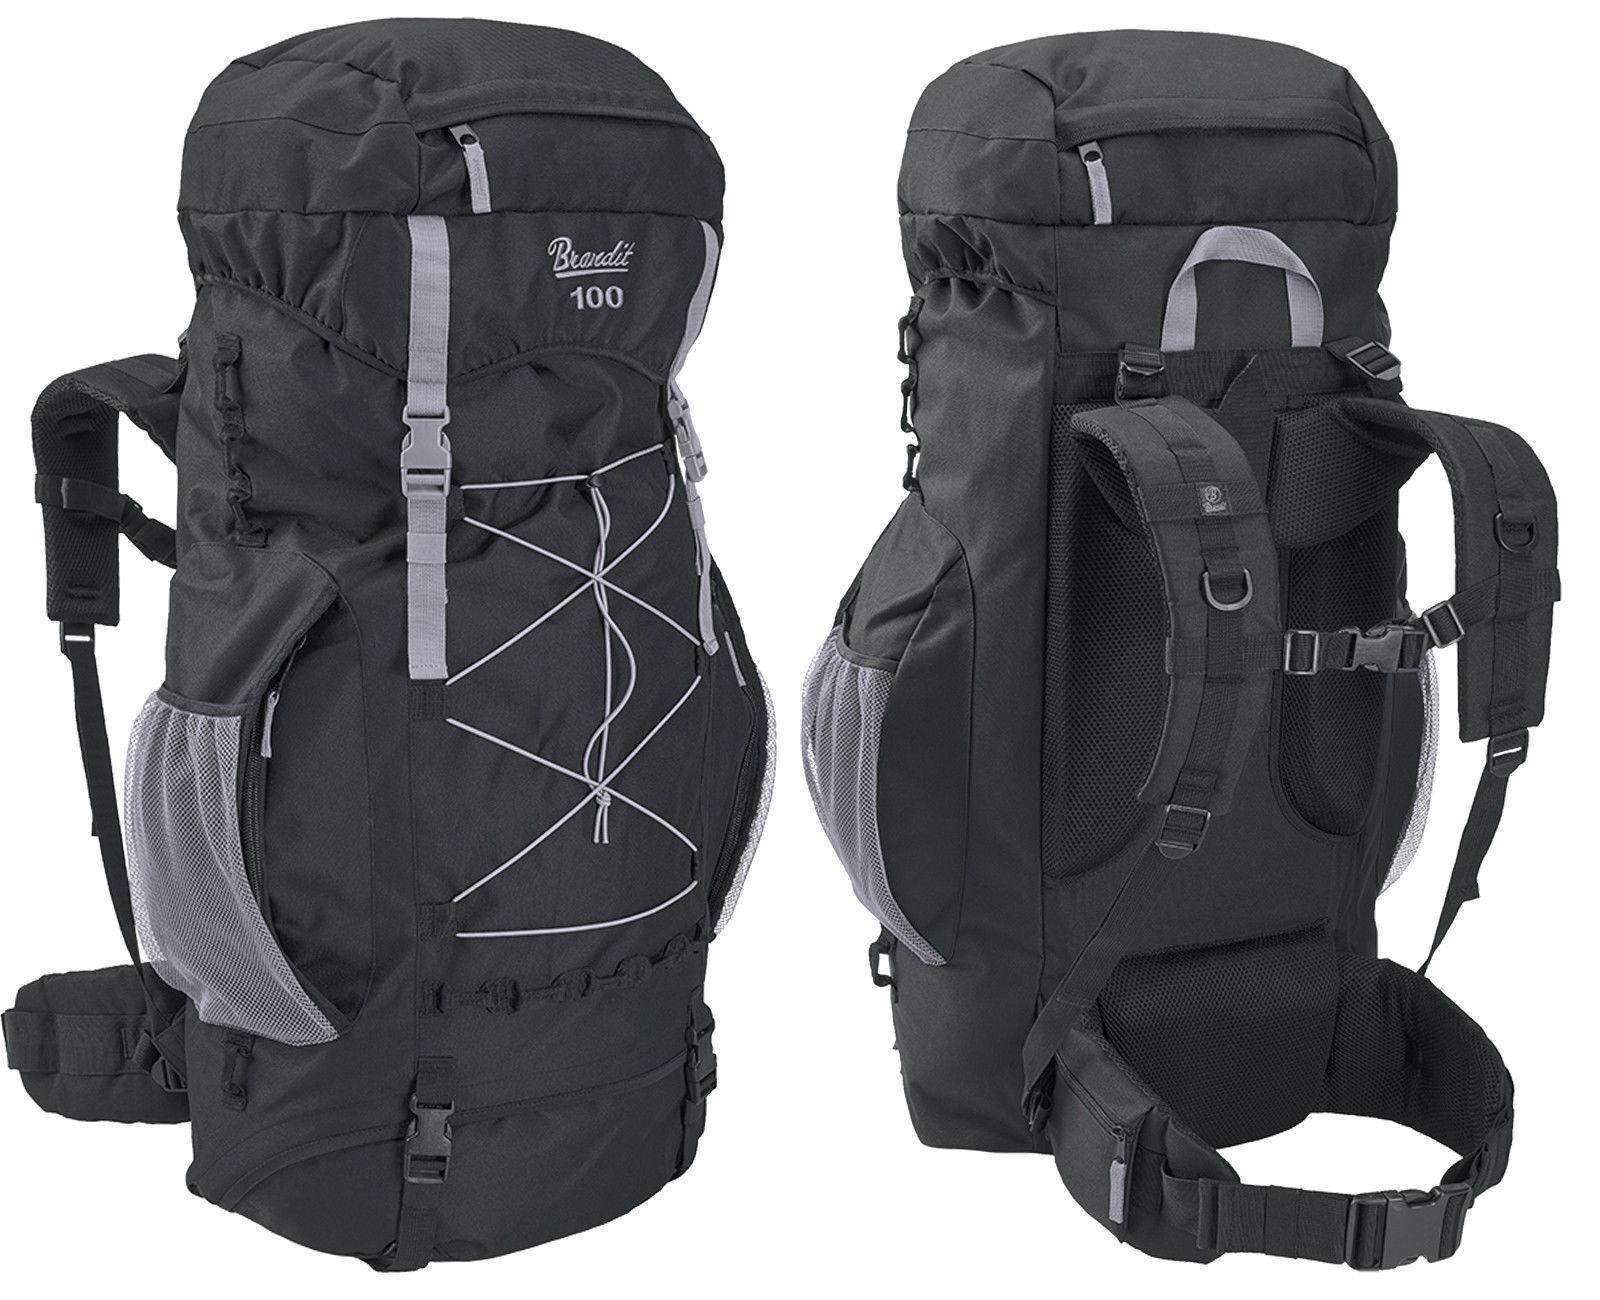 Brandit Rucksack AVIATOR 35-100 35-100 35-100 Liter Trekking rucksack Outdoor mit Regenhülle fa1b34